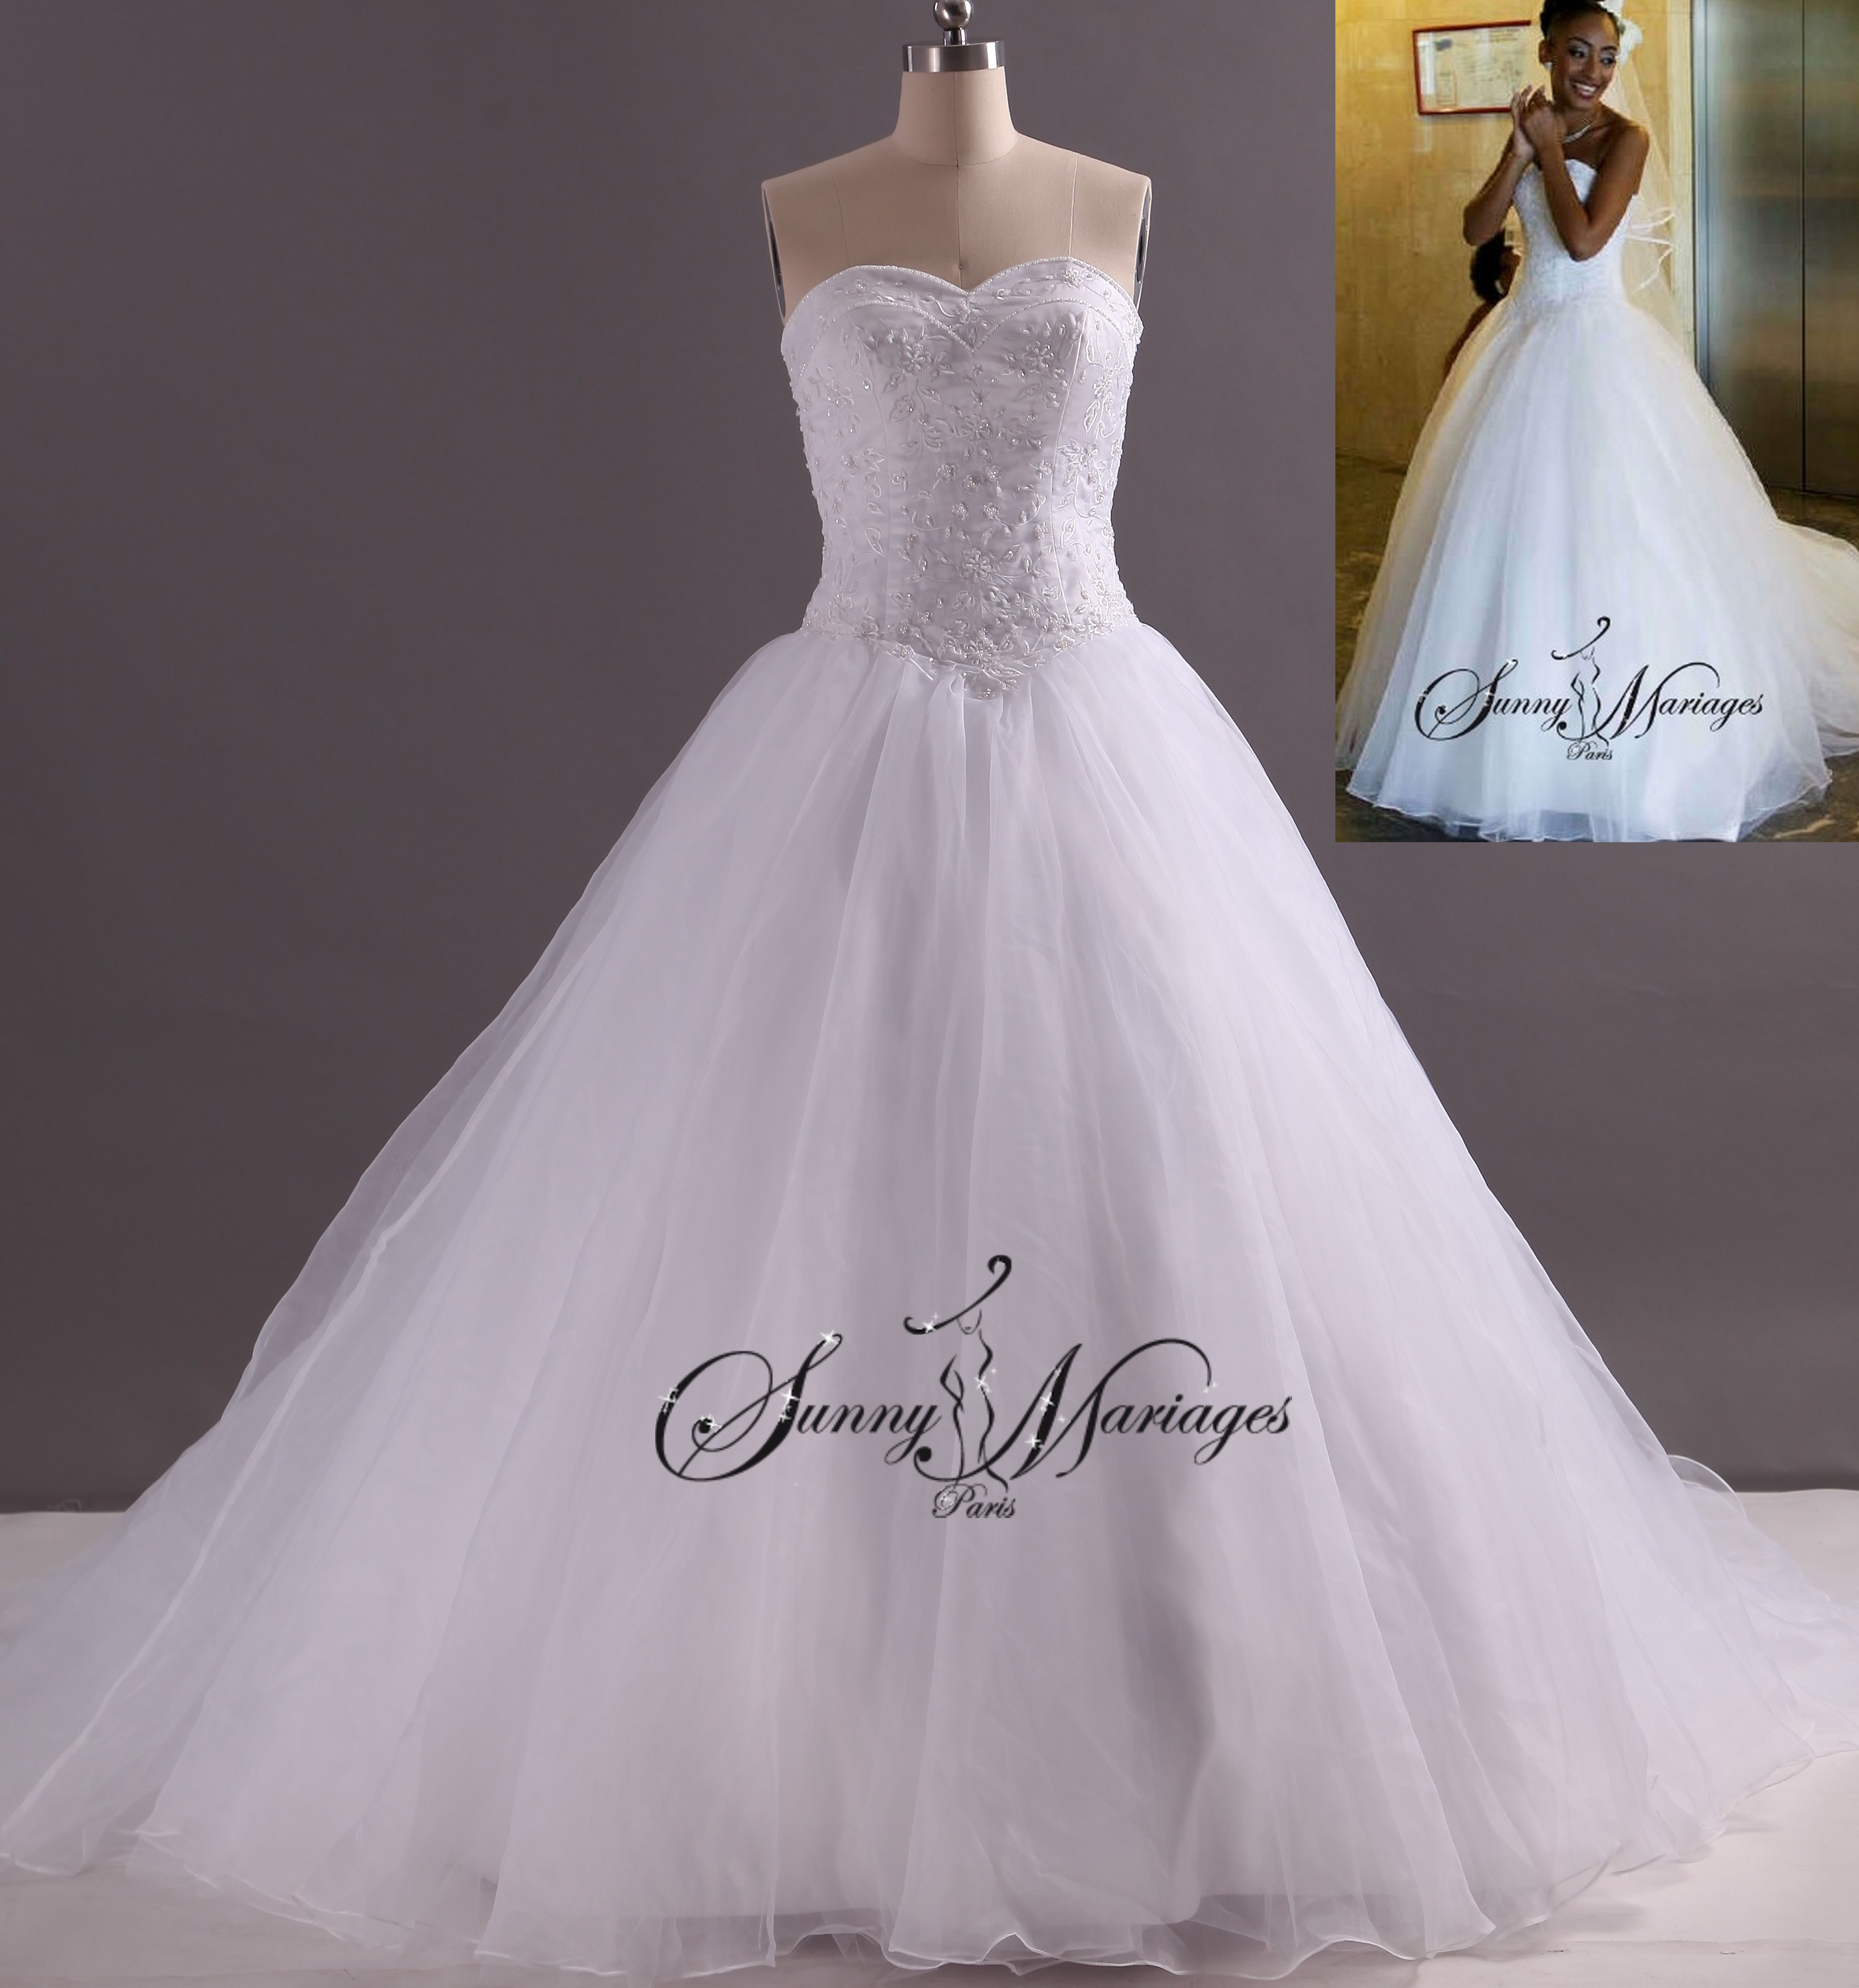 robe de mariee princesse, robe de mariee bustier, robe blanche de ...